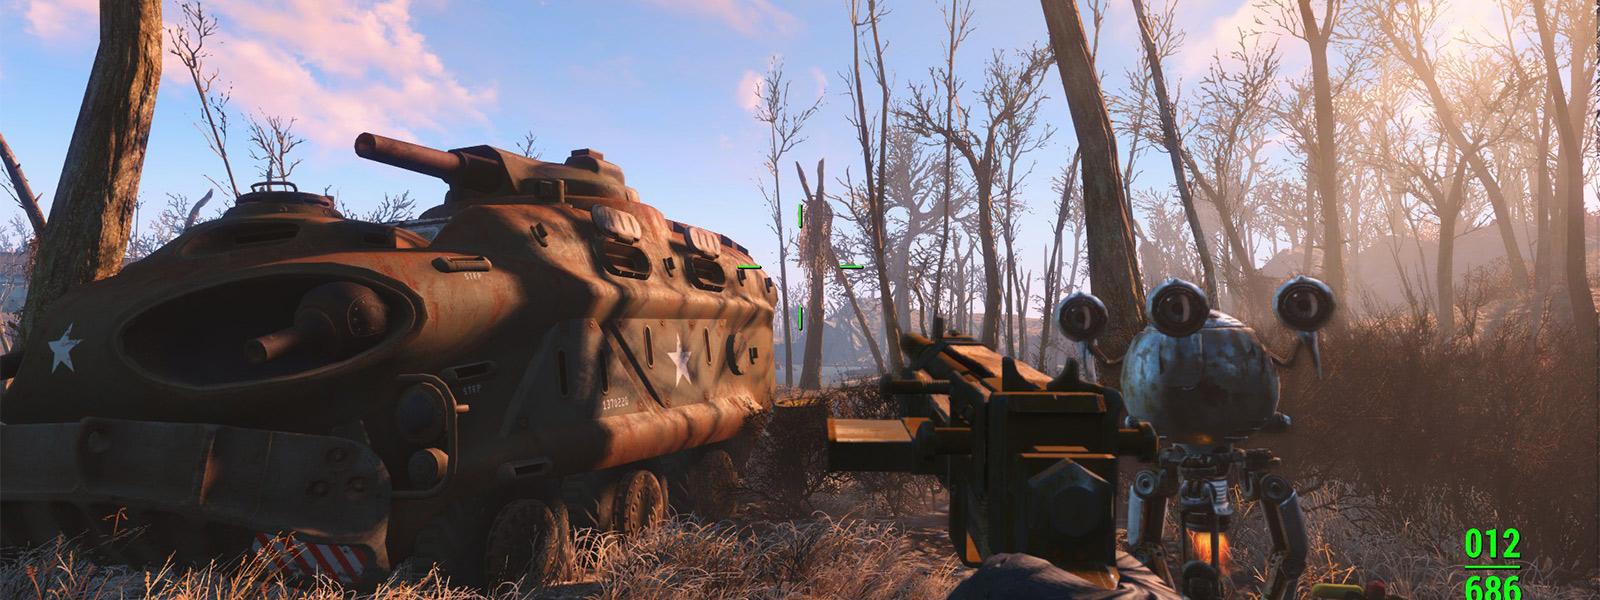 Мод Enbseries для Fallout 4